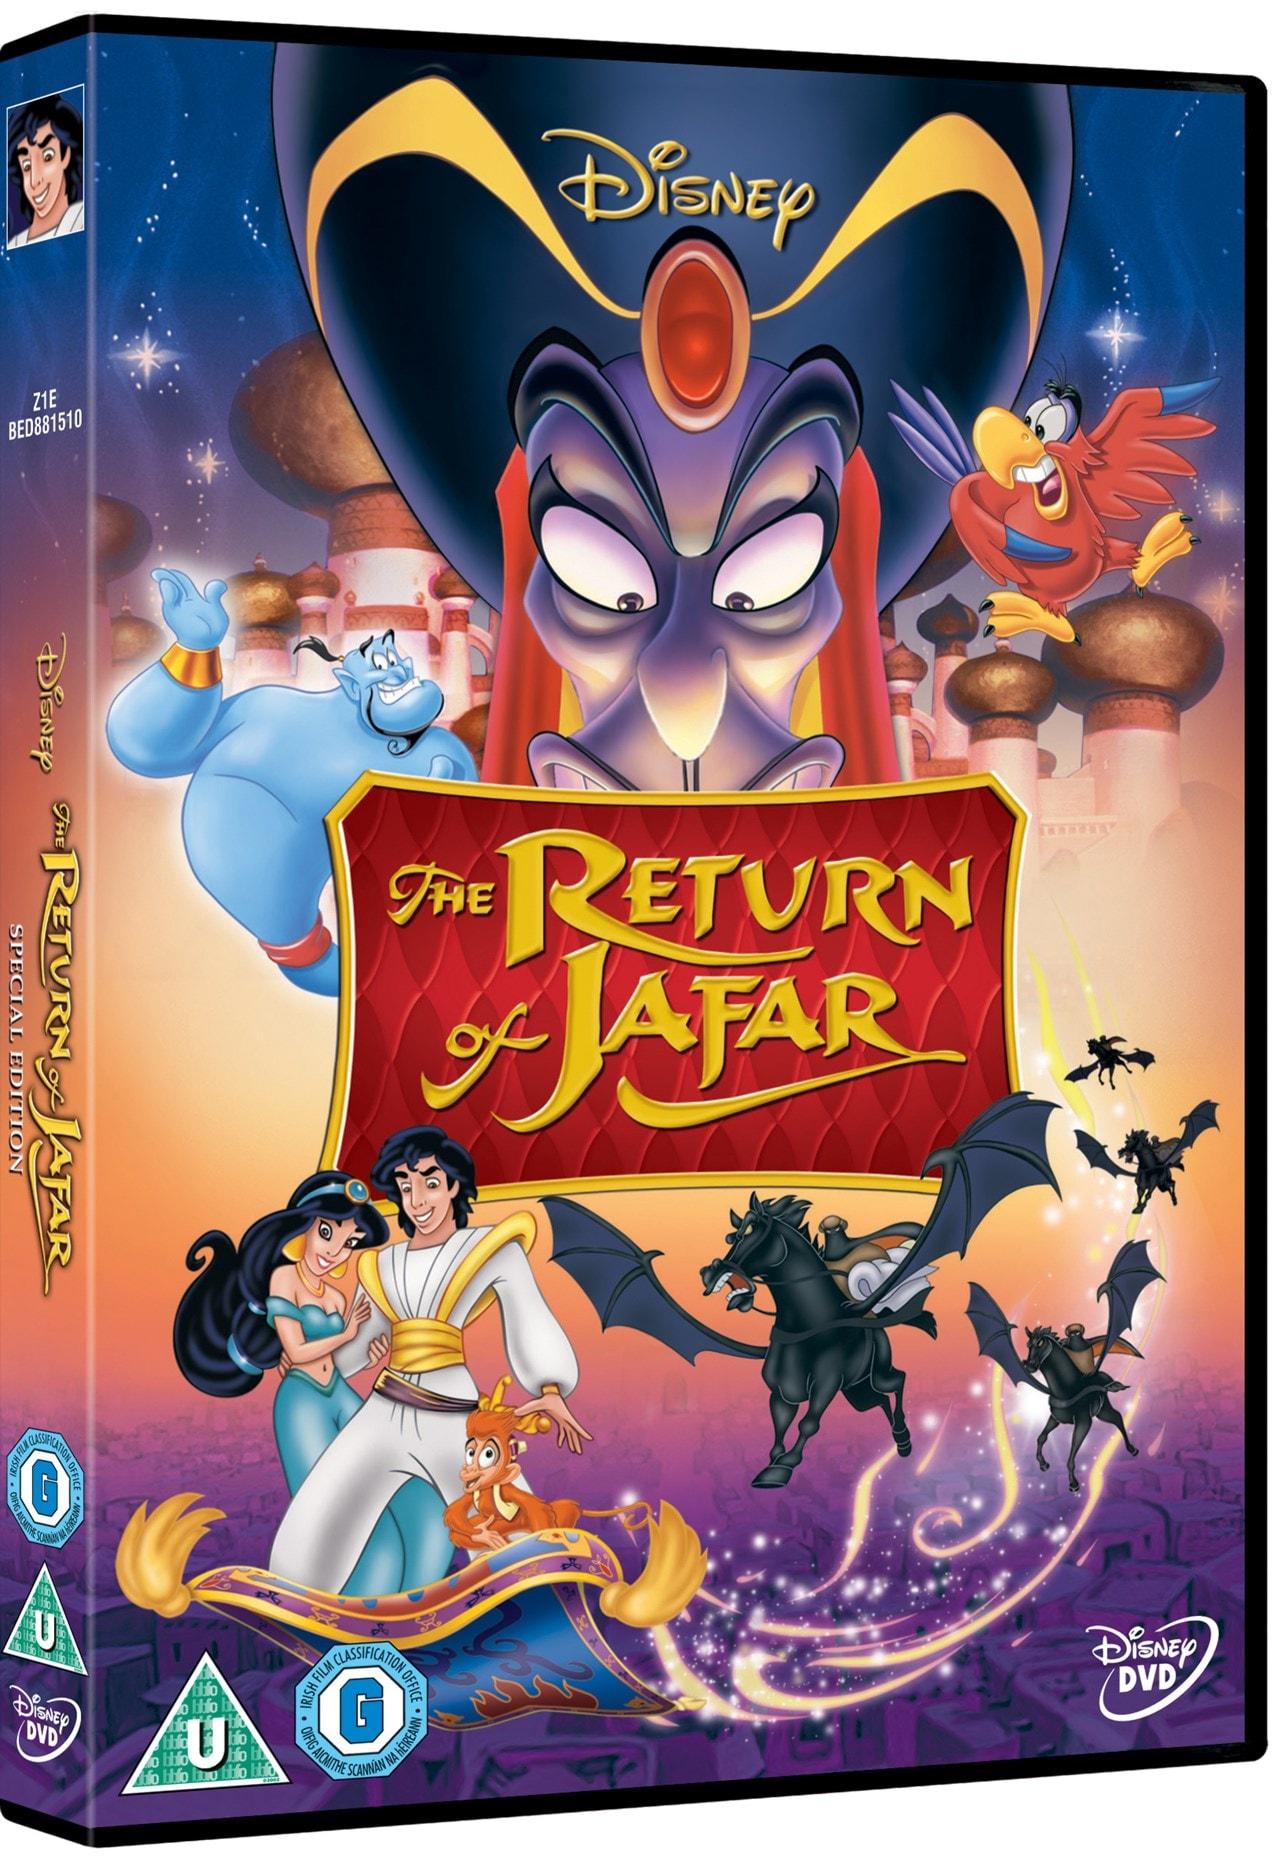 The Return of Jafar - 2